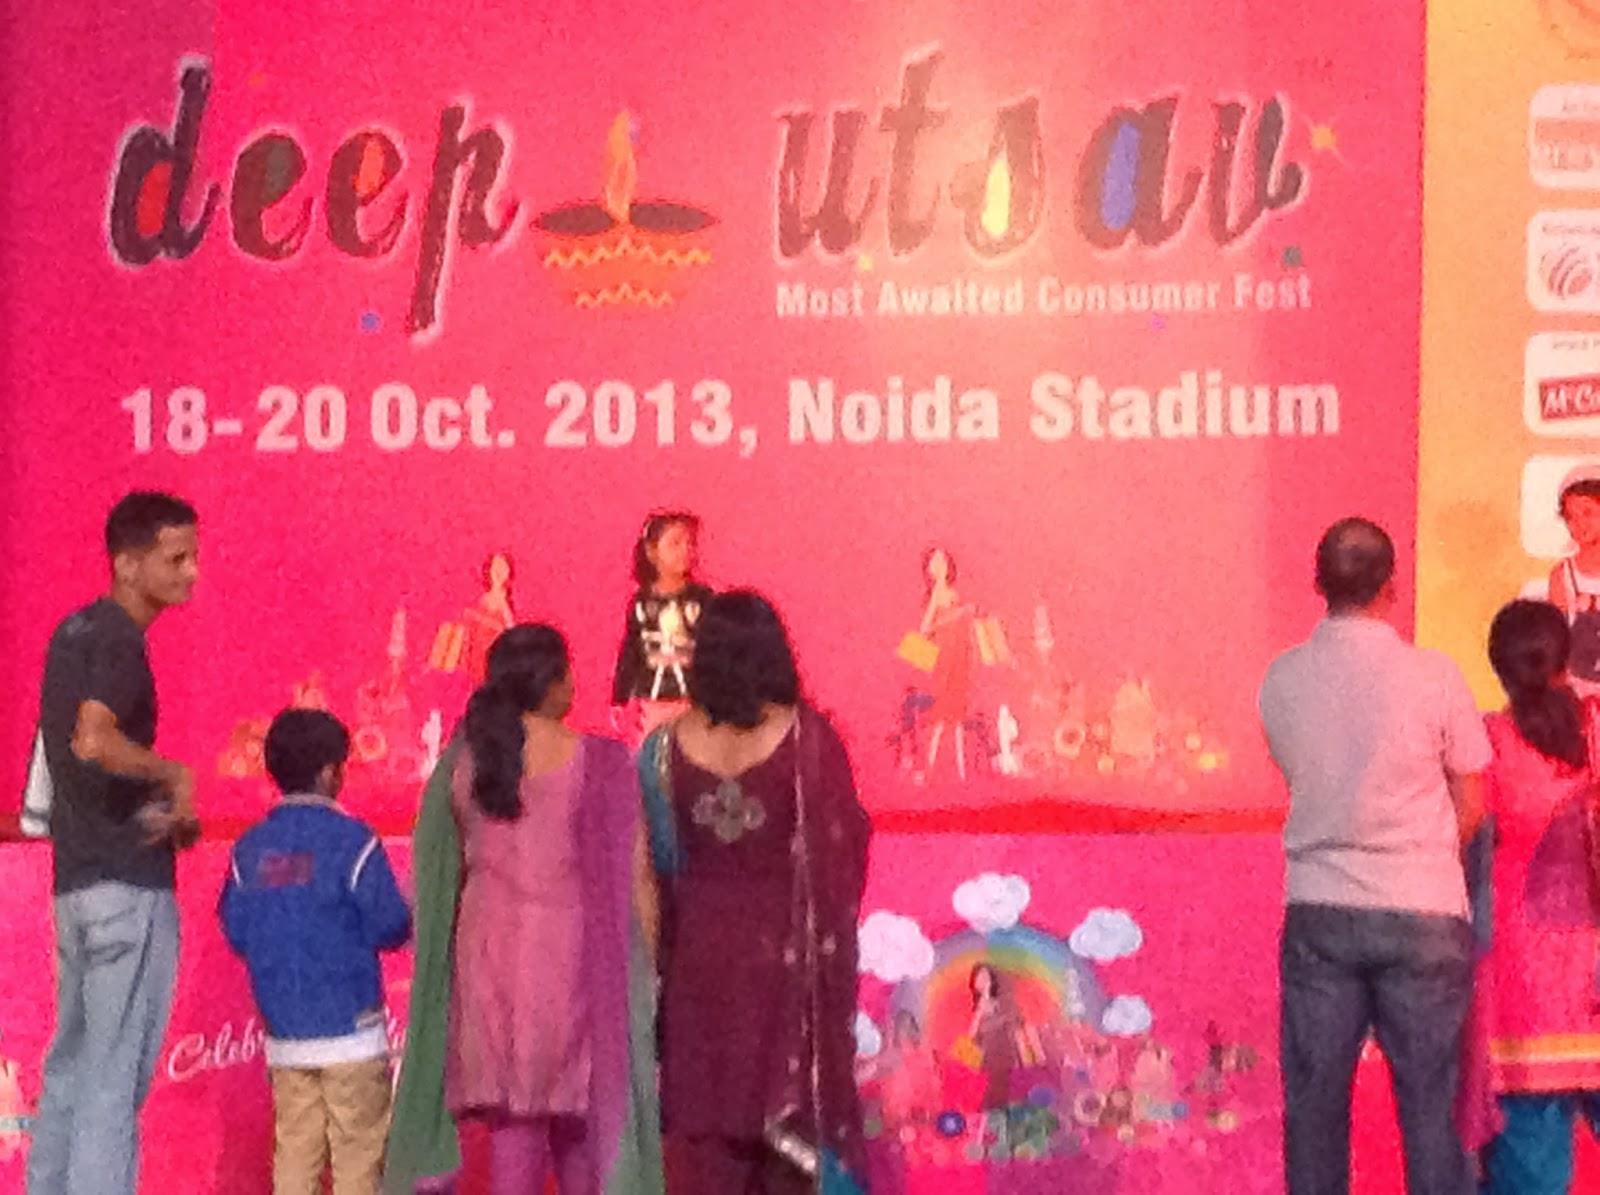 Deep Utsav 2013 at Noida Stadium